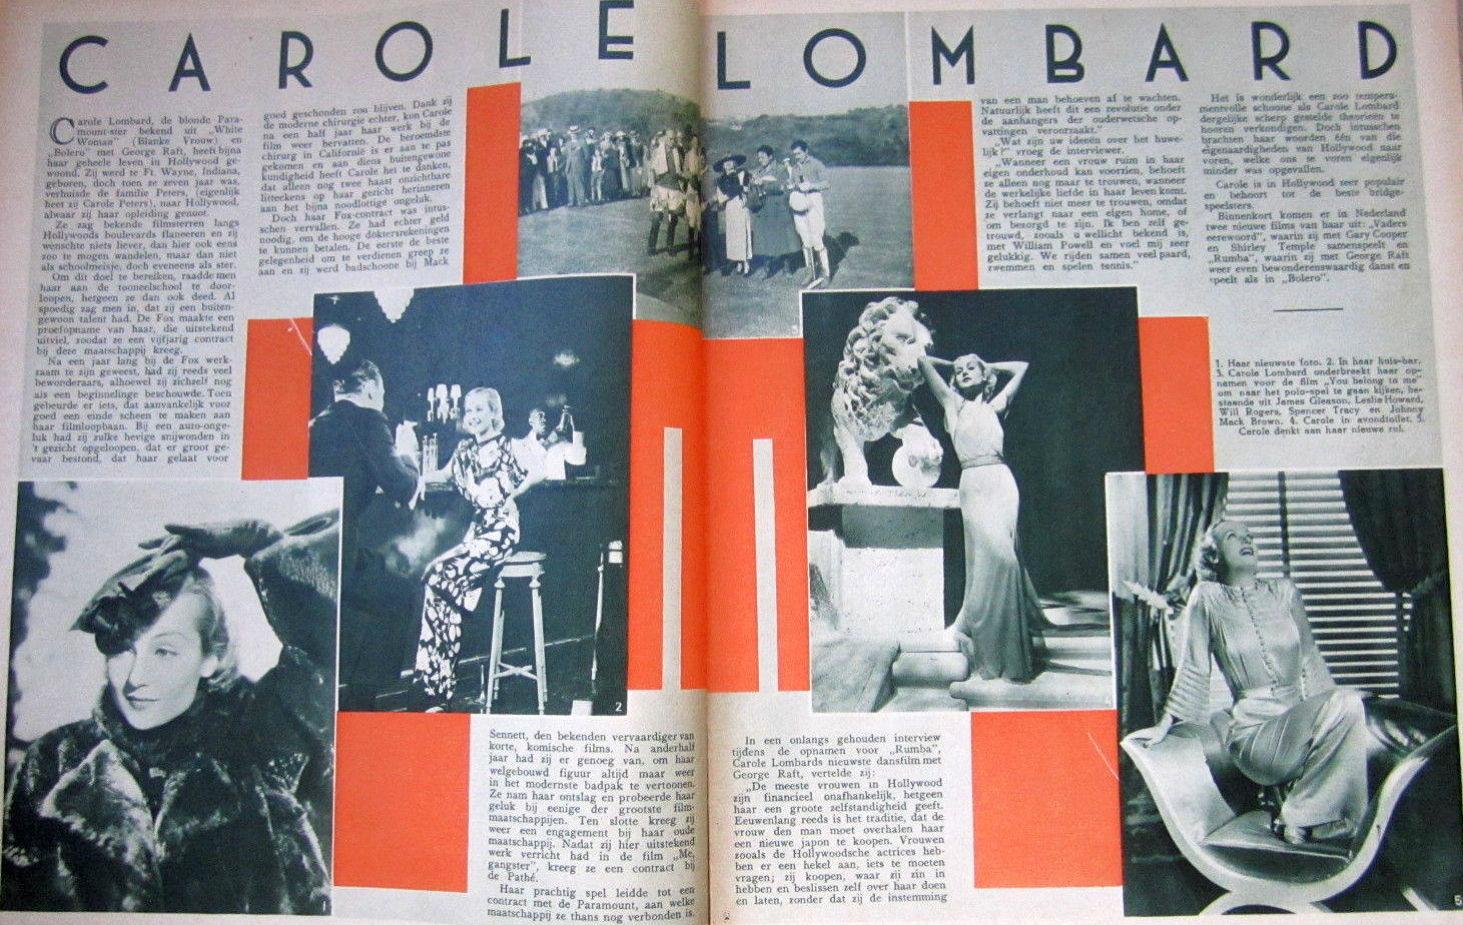 carole lombard cinema & theater 050435a